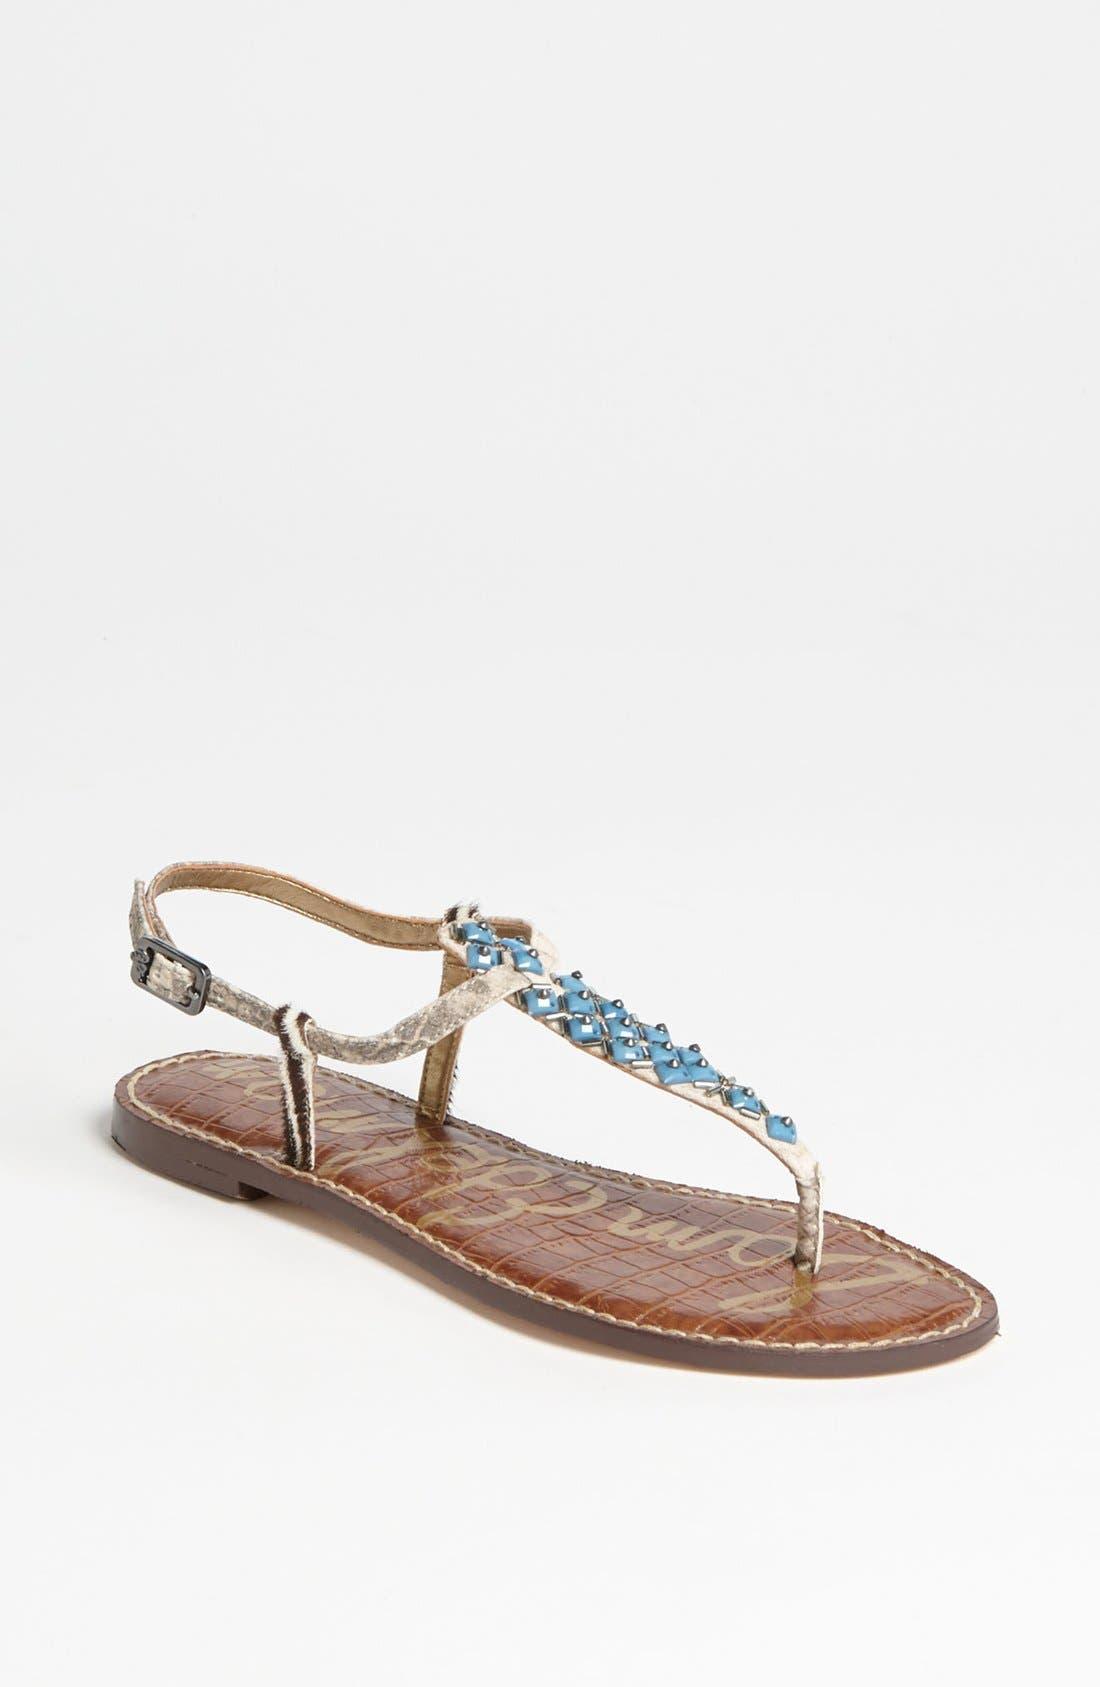 Main Image - Sam Edelman 'Gaines' Sandal